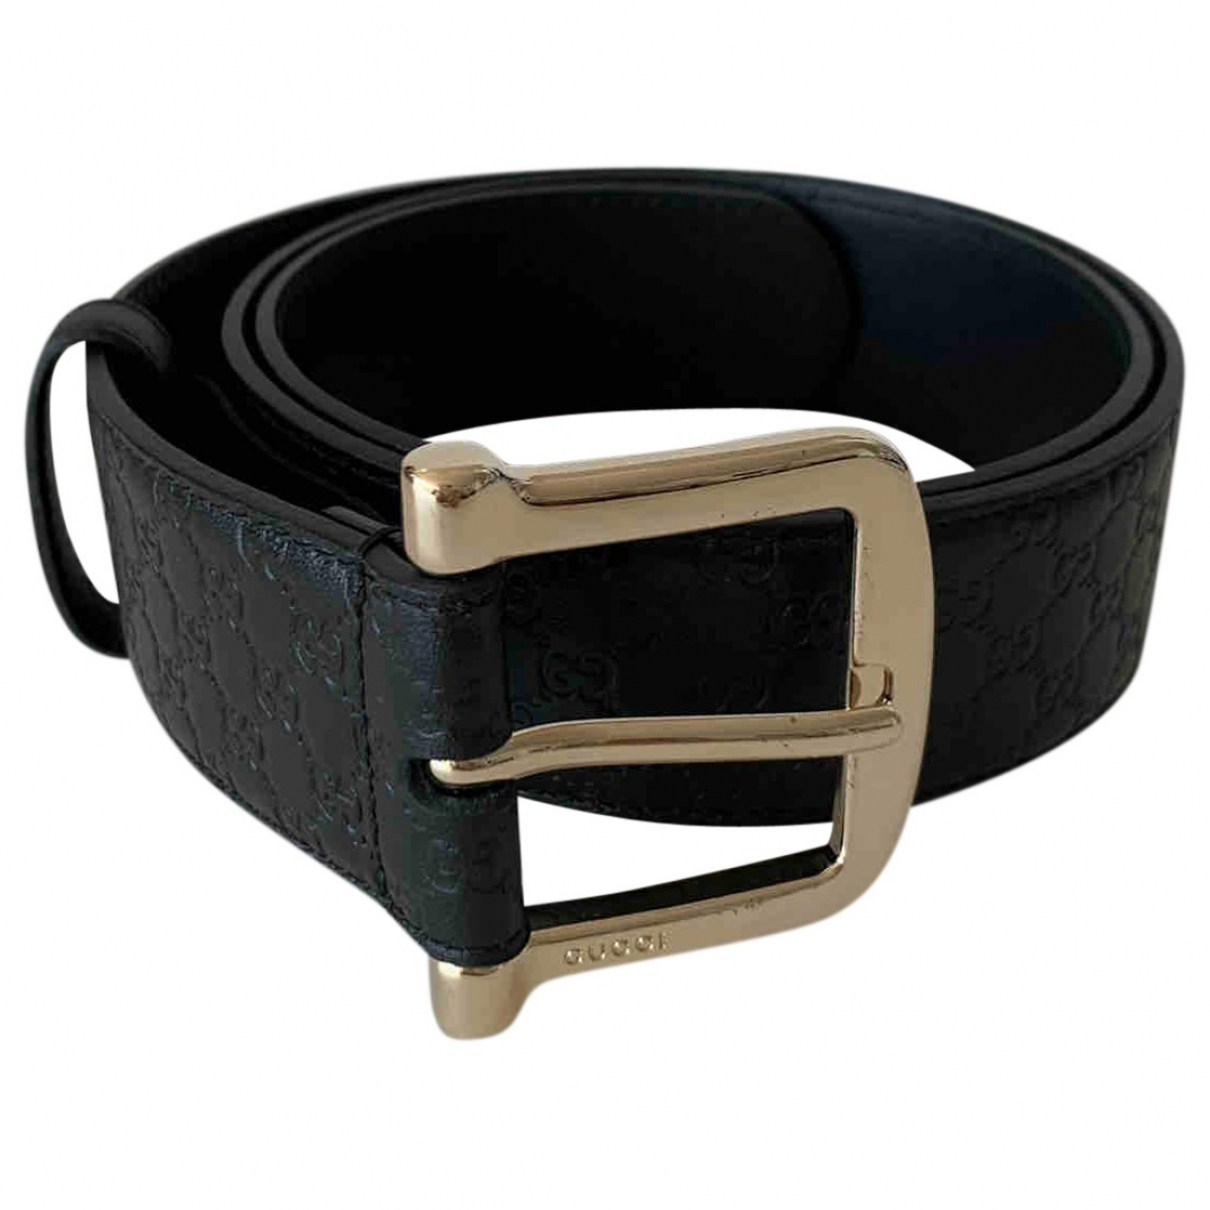 Gucci N Black Leather belt for Women 85 cm